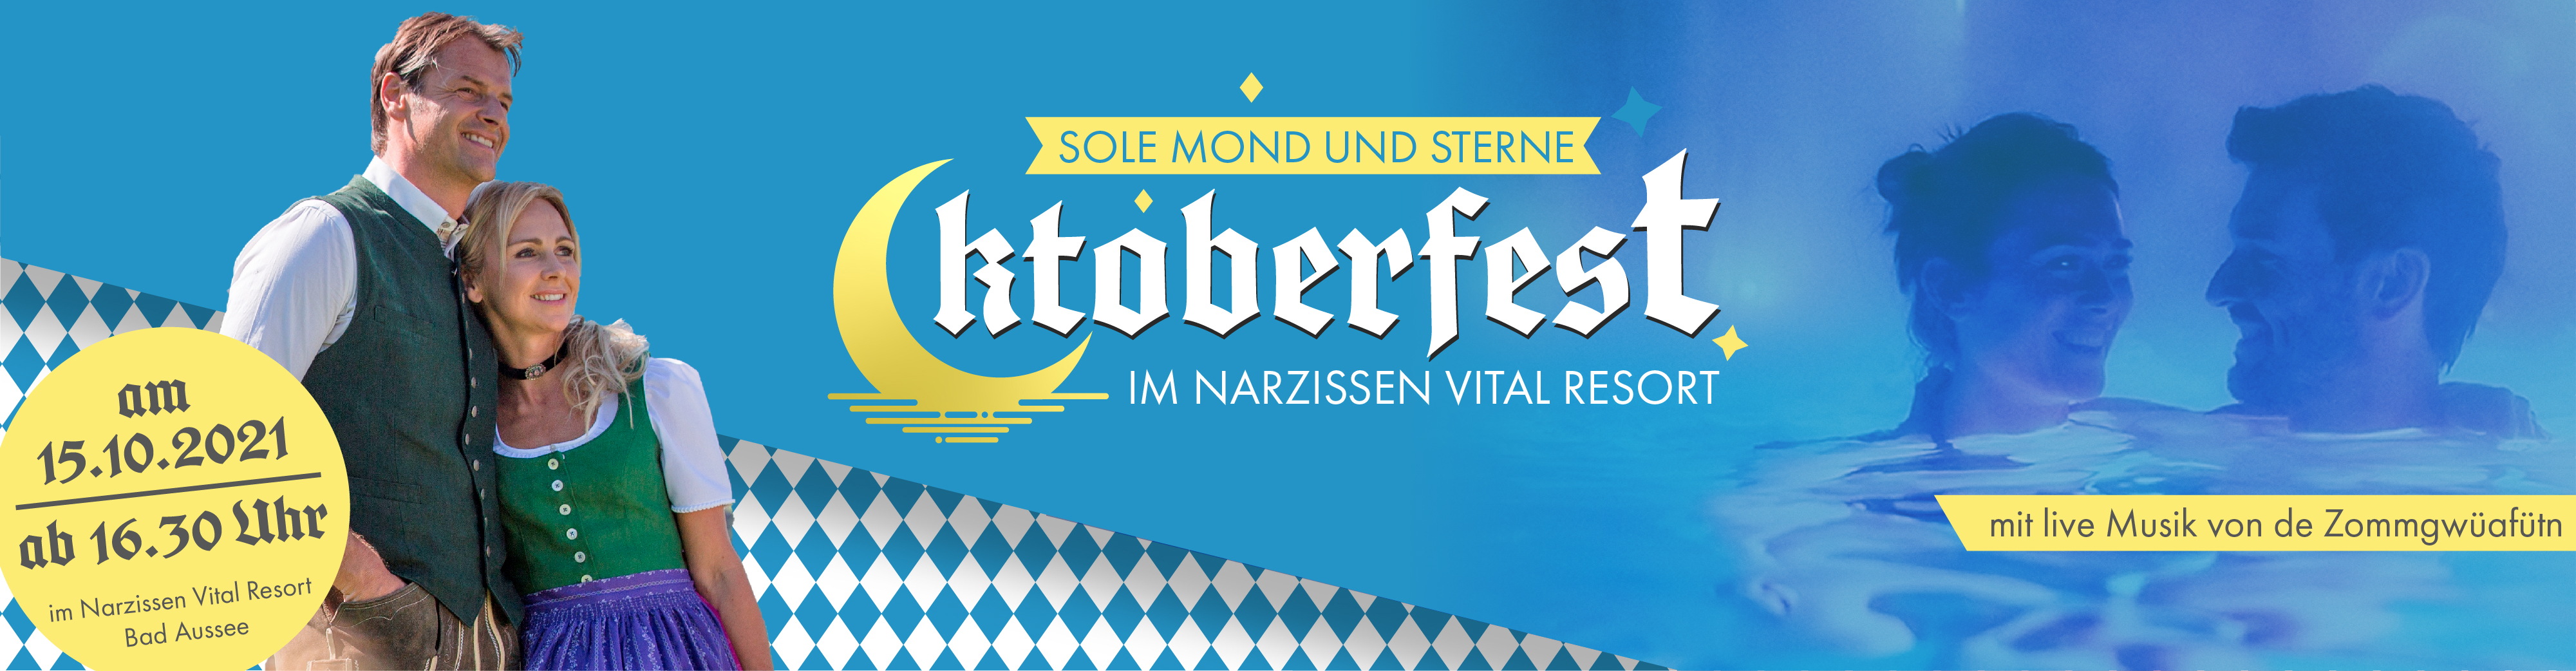 Solemondundstern Sujets Oktoberfest Header Hp 1920x500